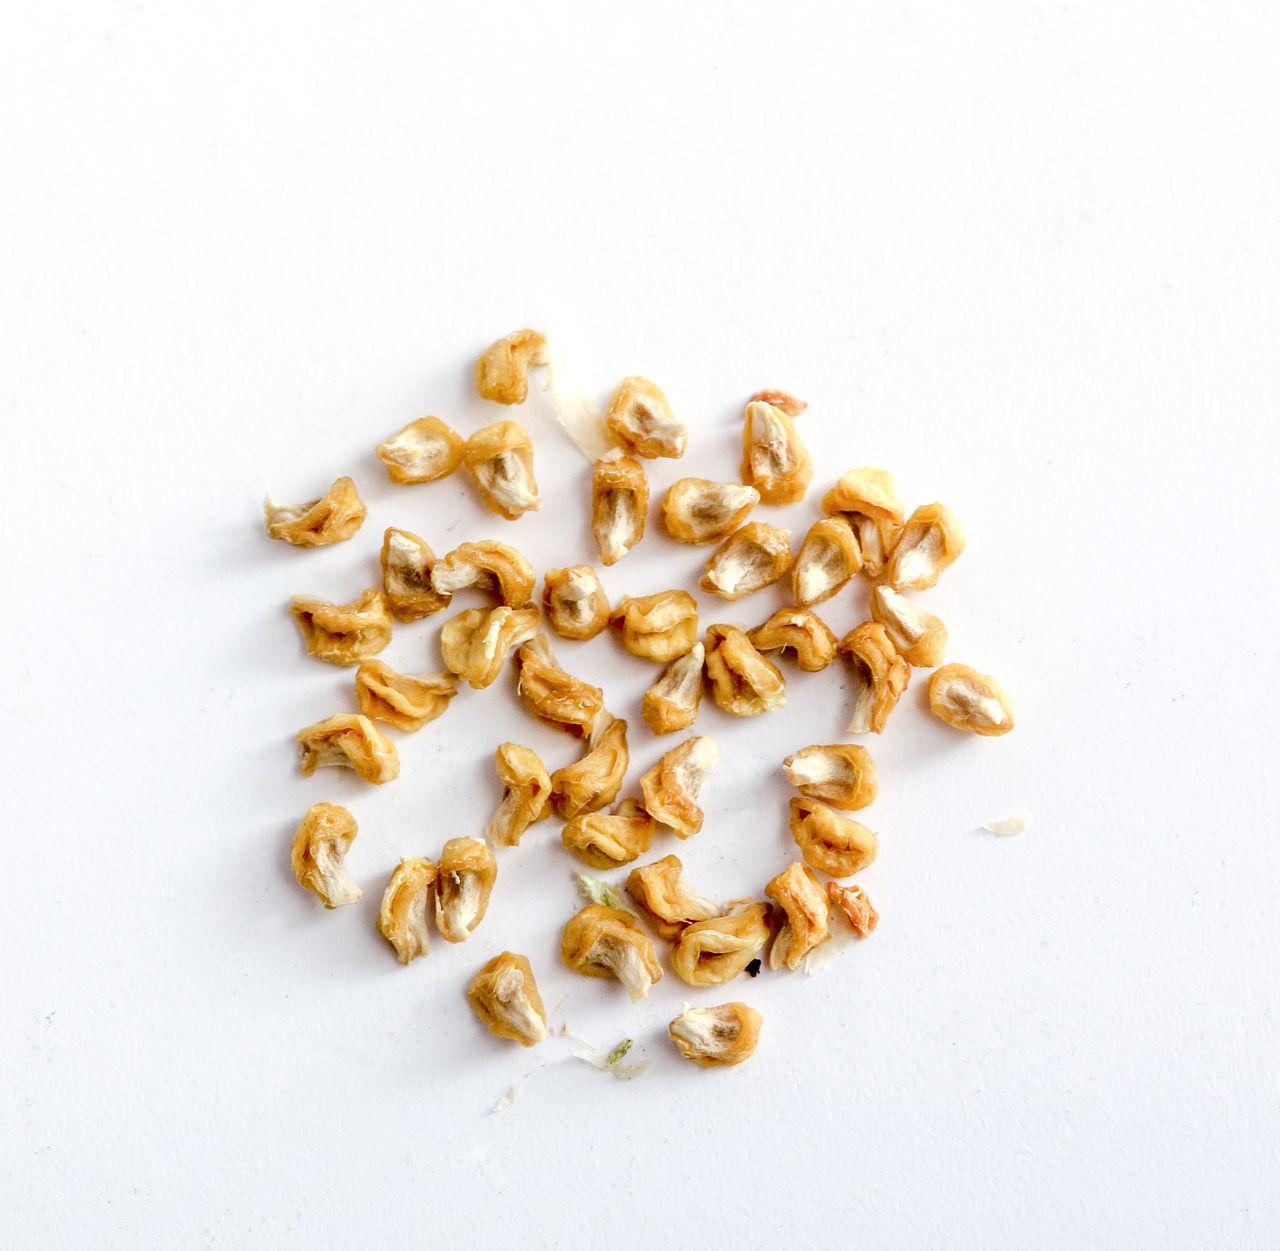 salted corn seeds Close-up Corn Dry Food Healthy Eating Healthy Food No People Salt Corn Seeds Salted Corn Seed Seeds Vegetarian Food White Background